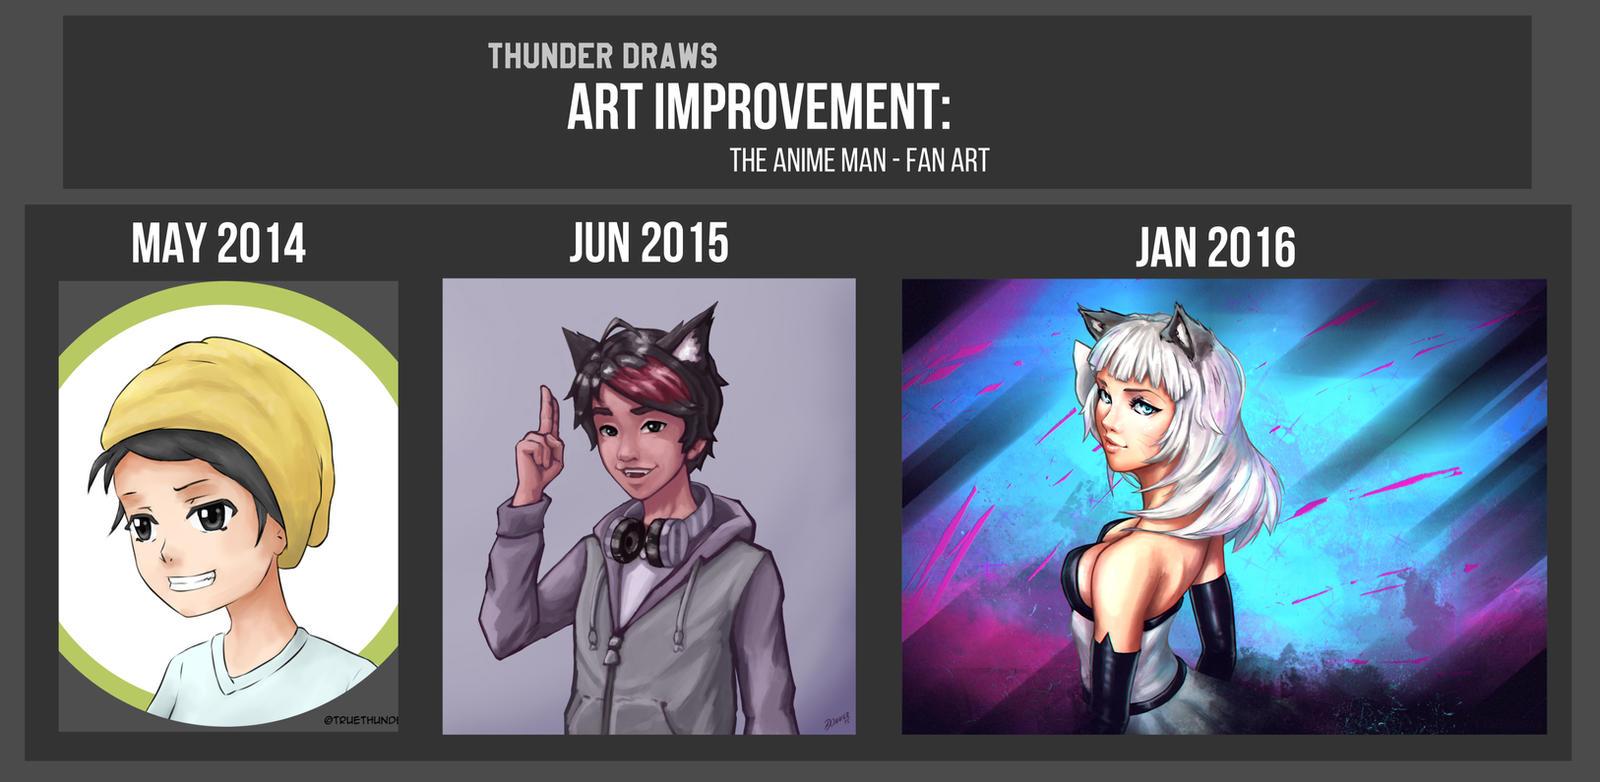 Art Improvement - TheAnimeMan fanart! by NaiBuff